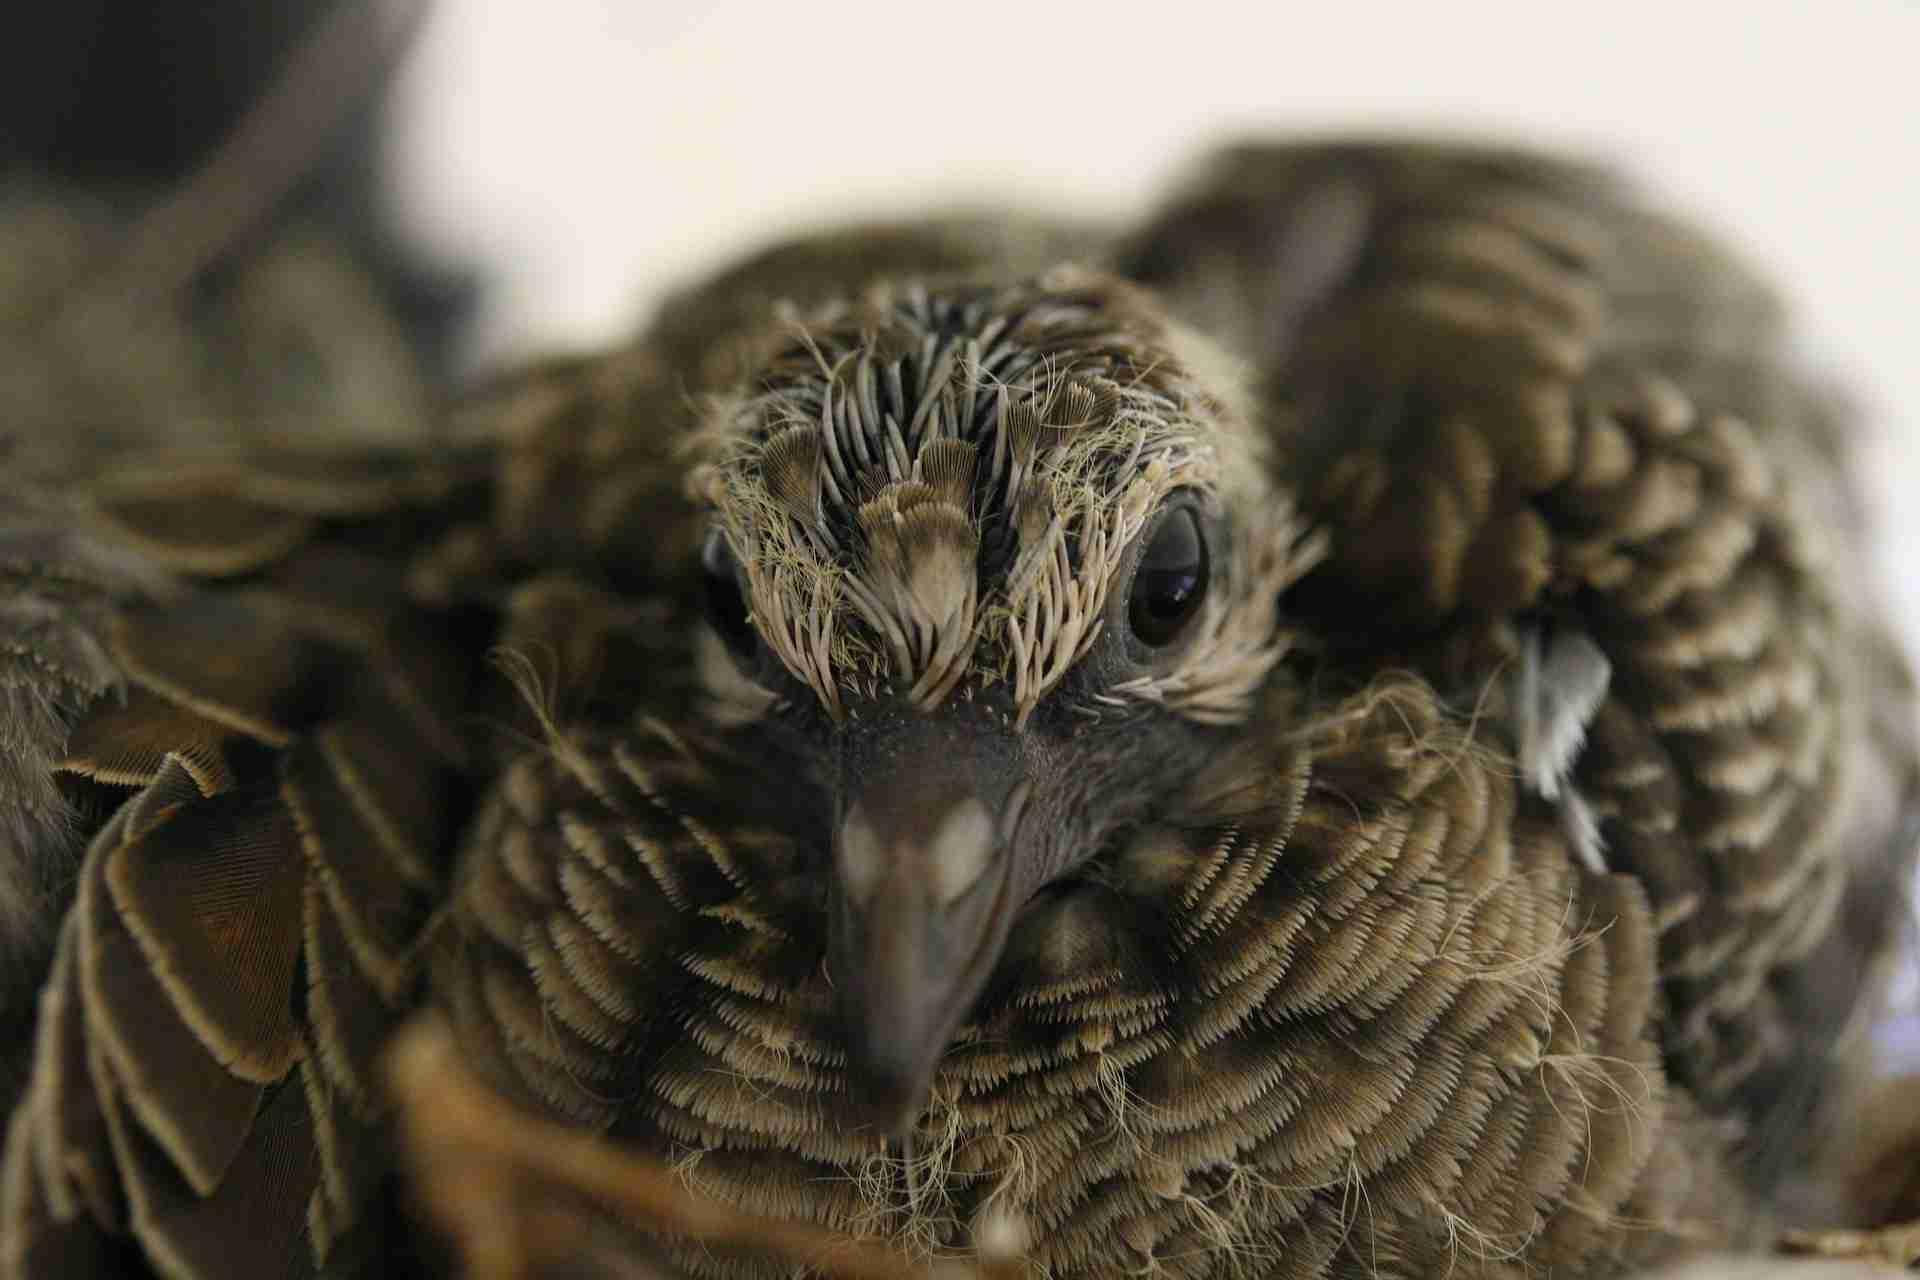 Baby-Taube sehen